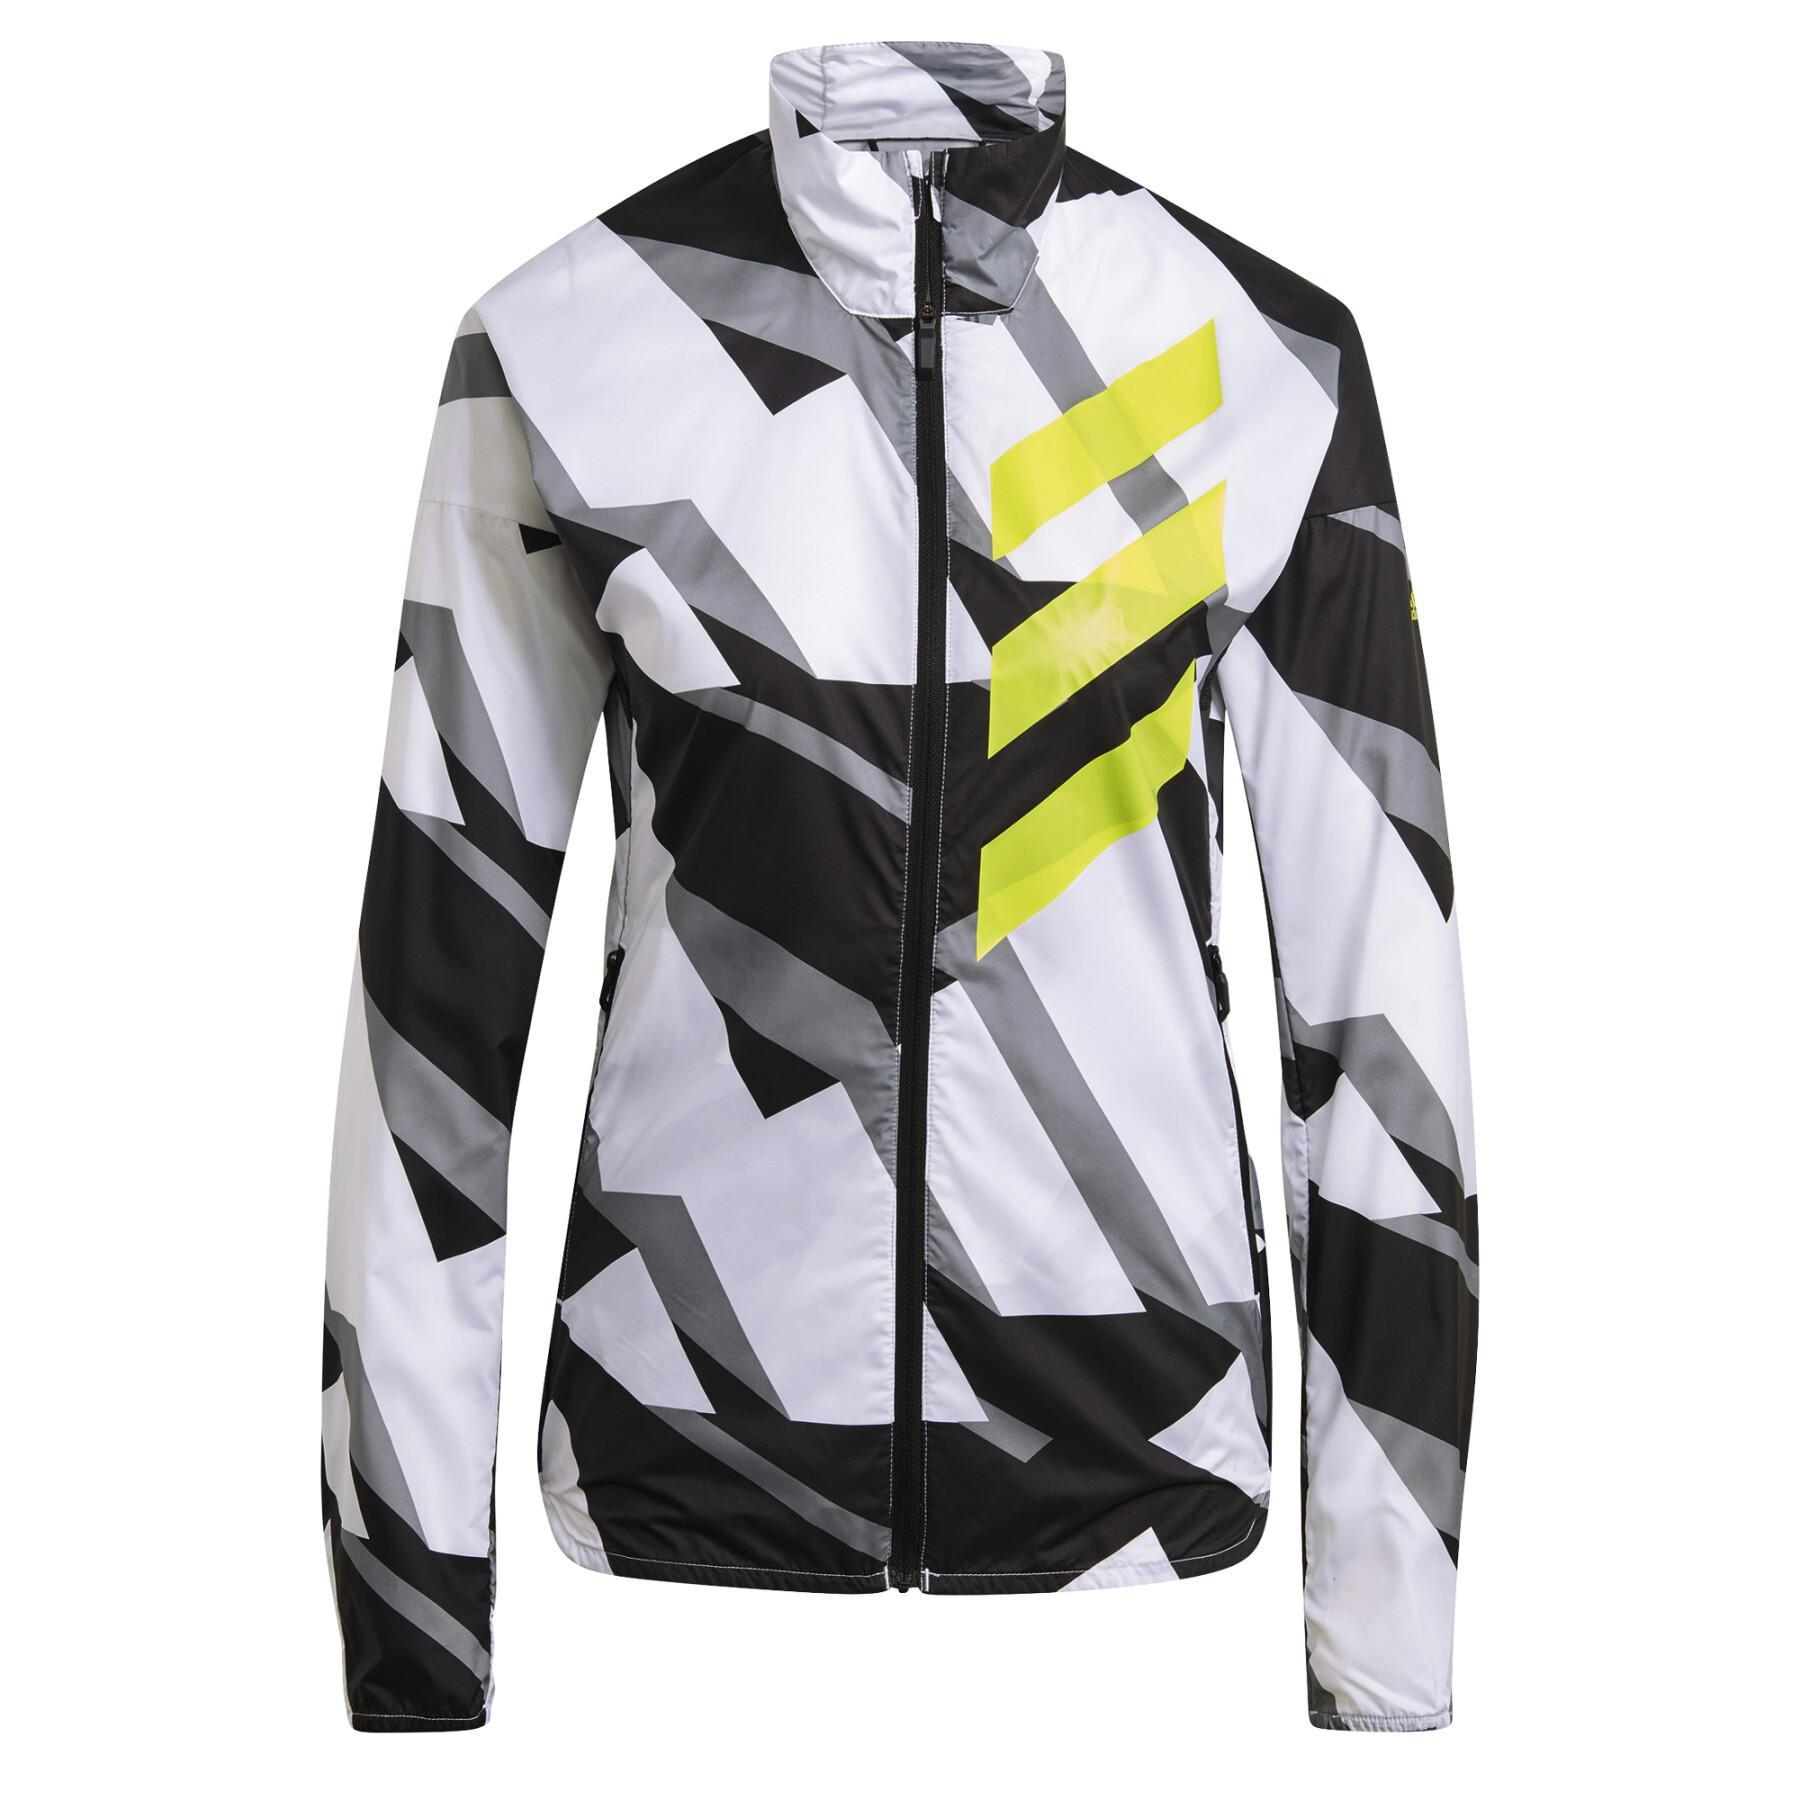 Women's windbreaker jacket adidas Terrex Parley Agravic Trail Running